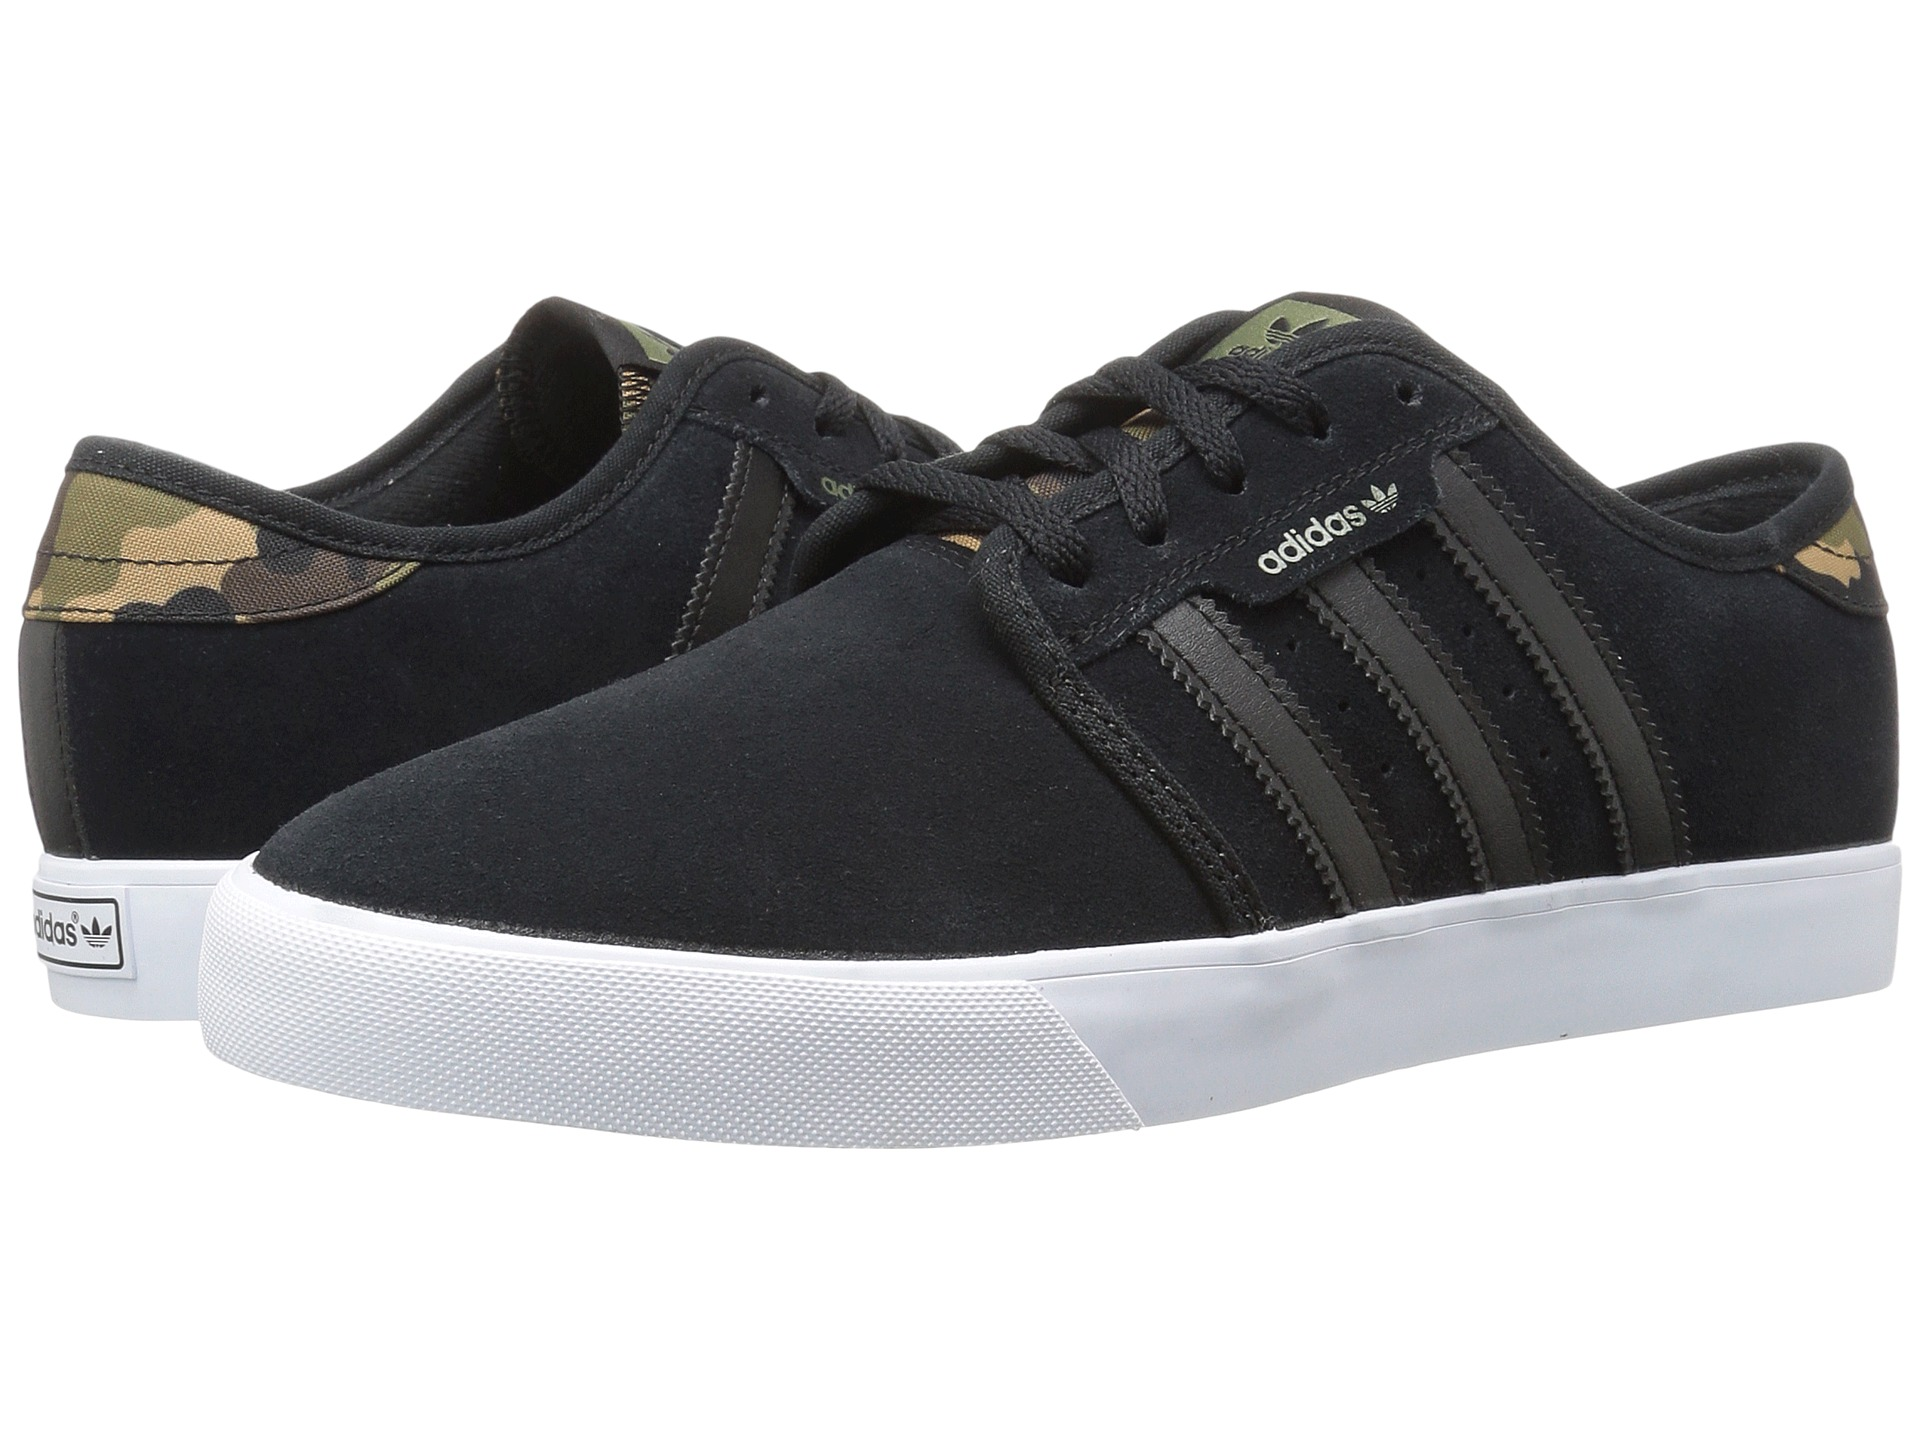 adidas Skateboarding Seeley at 6pm.com